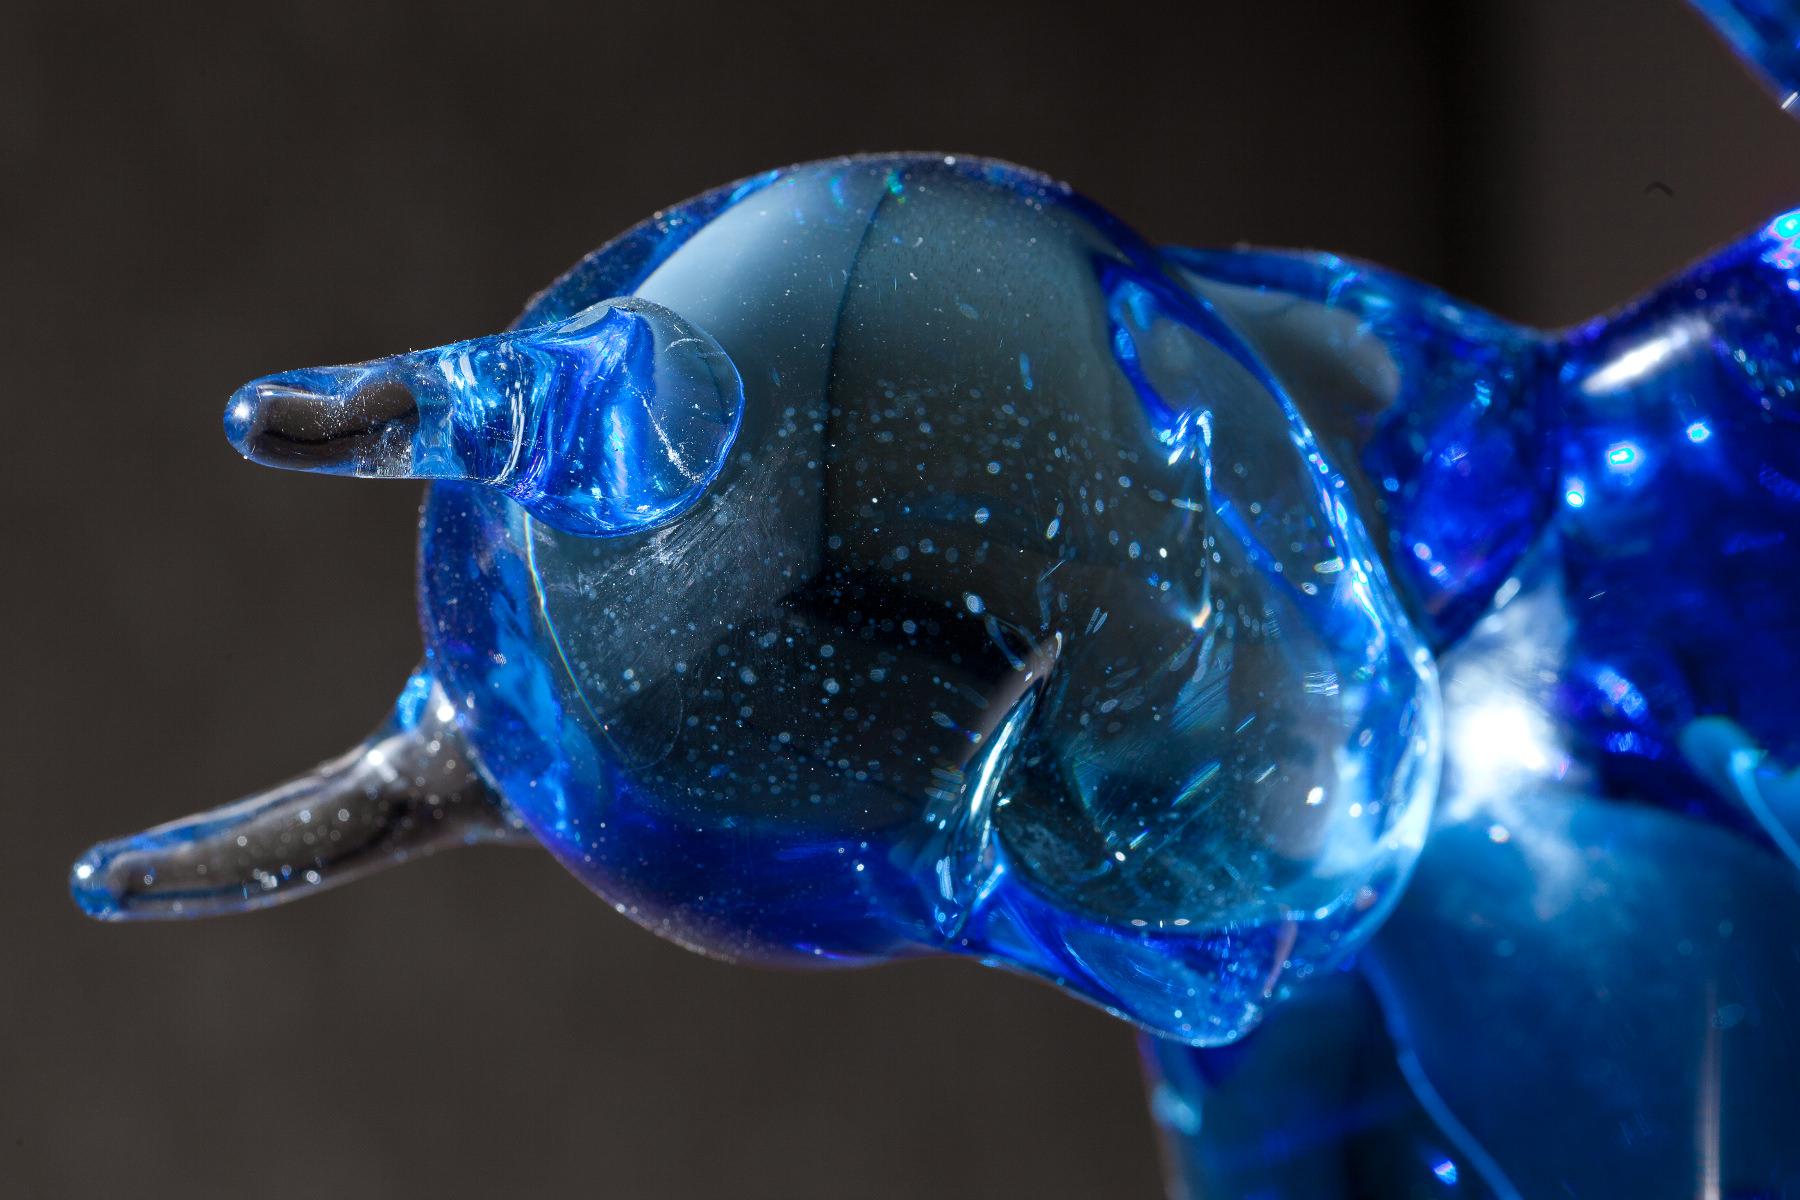 Tony Oursler - Blue Double Negative